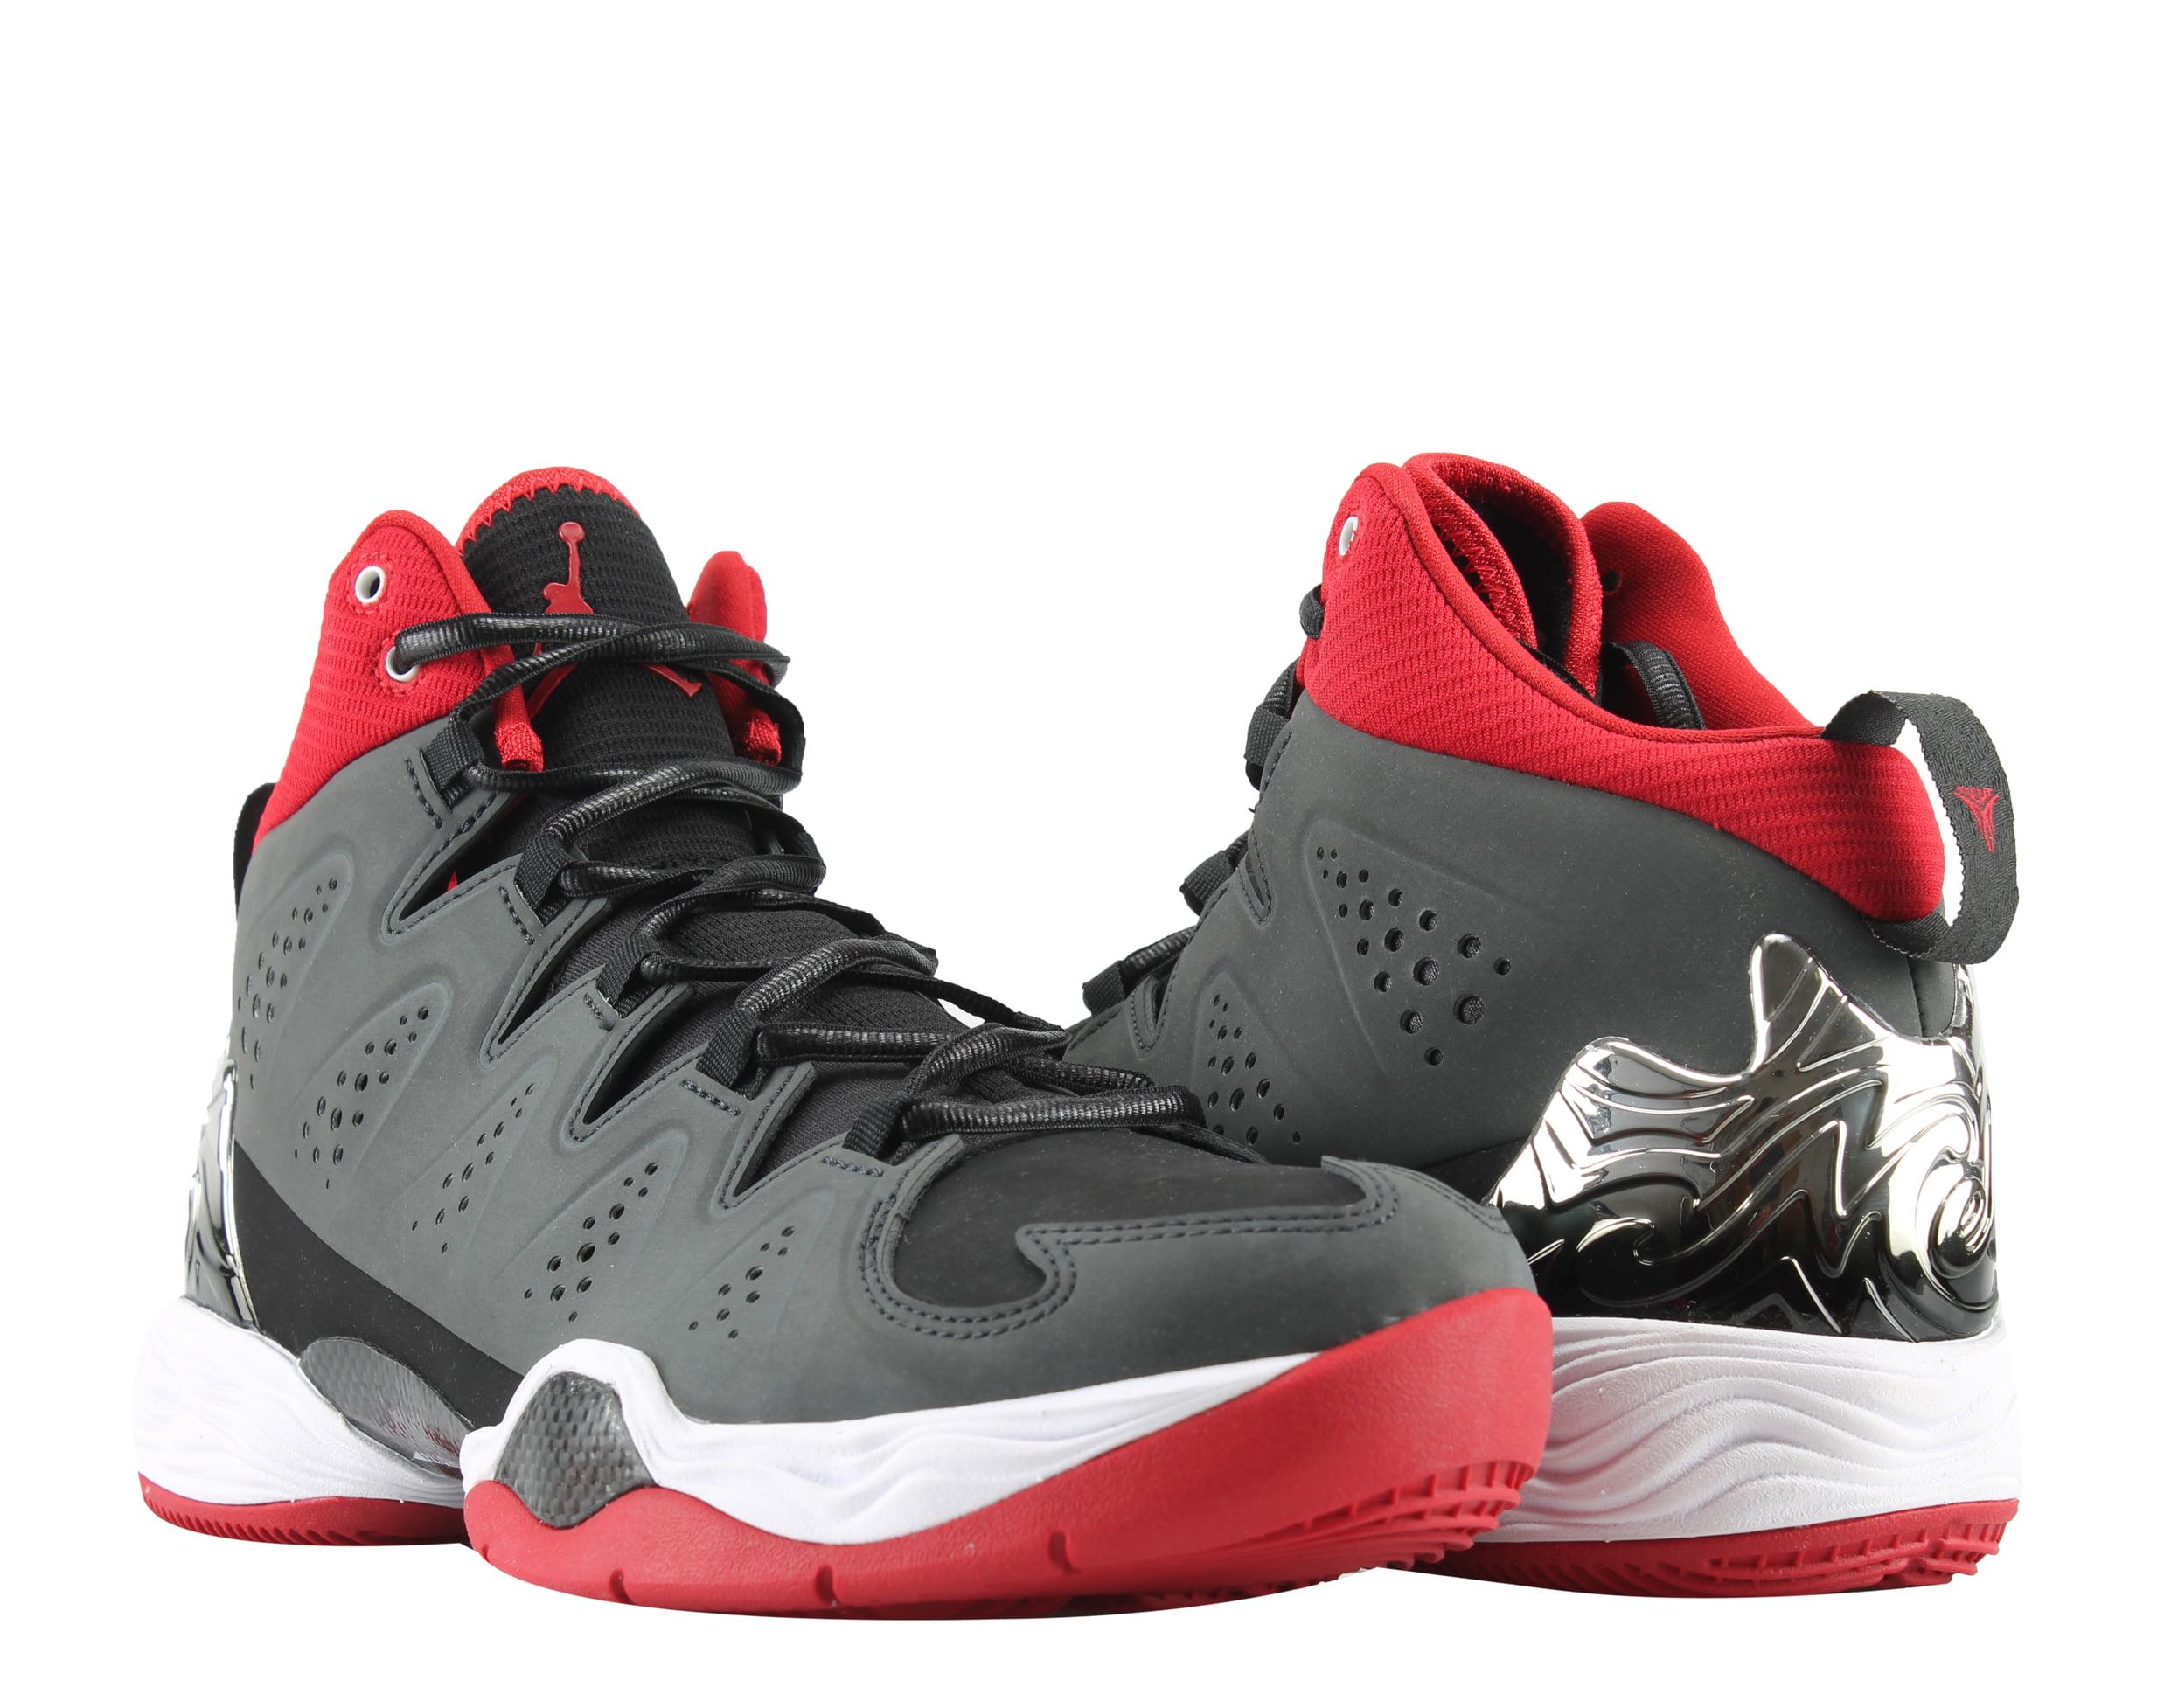 bbc9303bef82ce ... discount nike air jordan melo m10 anthracite gym red mens basketball  shoes 629876 002 74ddf 18f3b